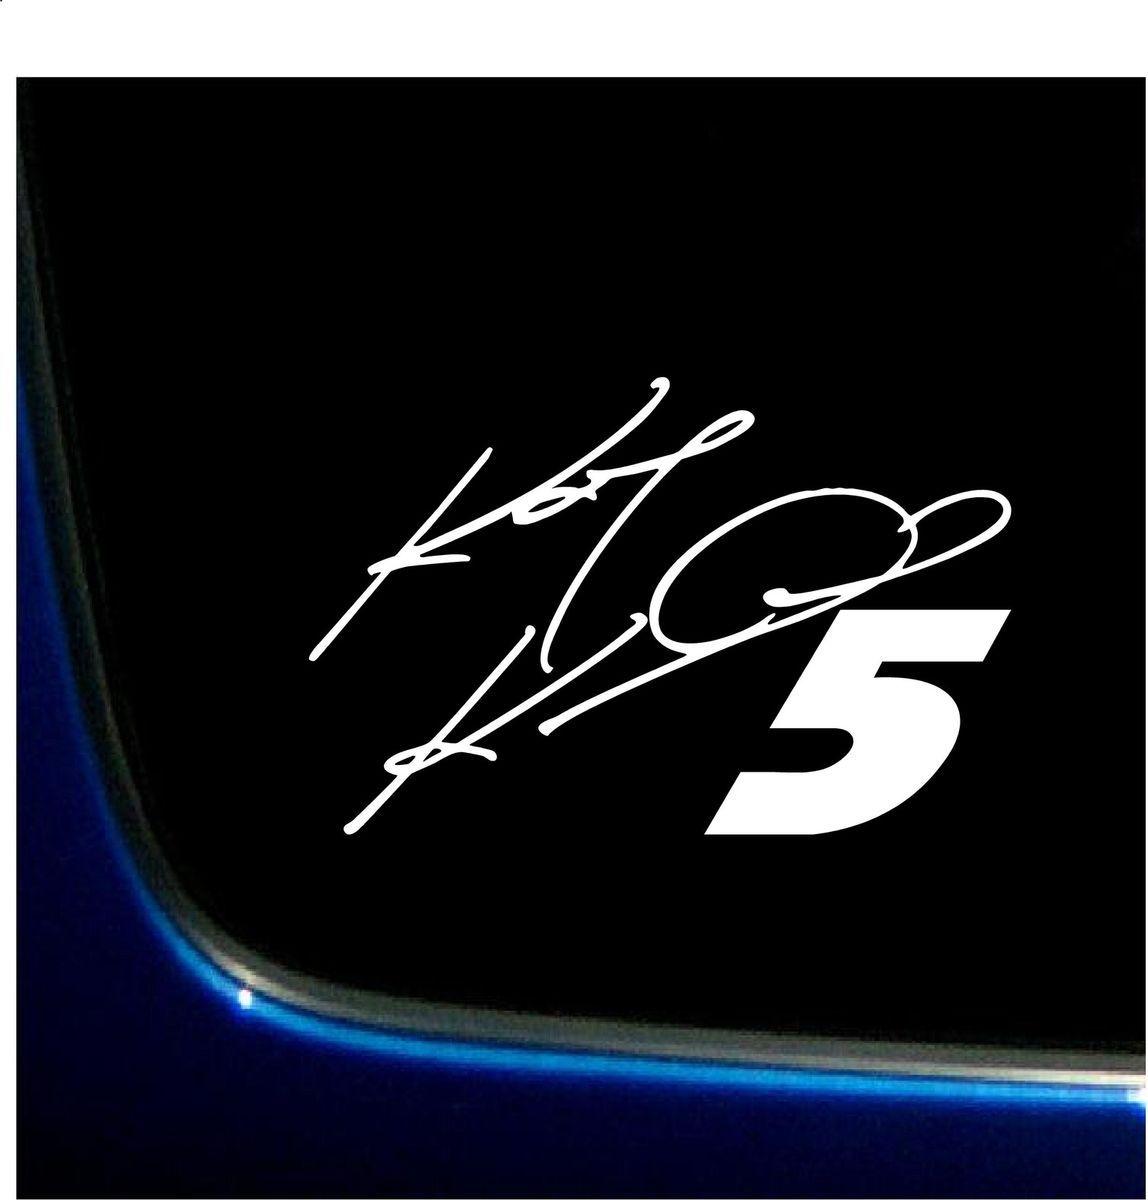 Kasey Kahne 5 Sticker Decal Vinyl Graphics 5 8 x 8 9 NASCAR